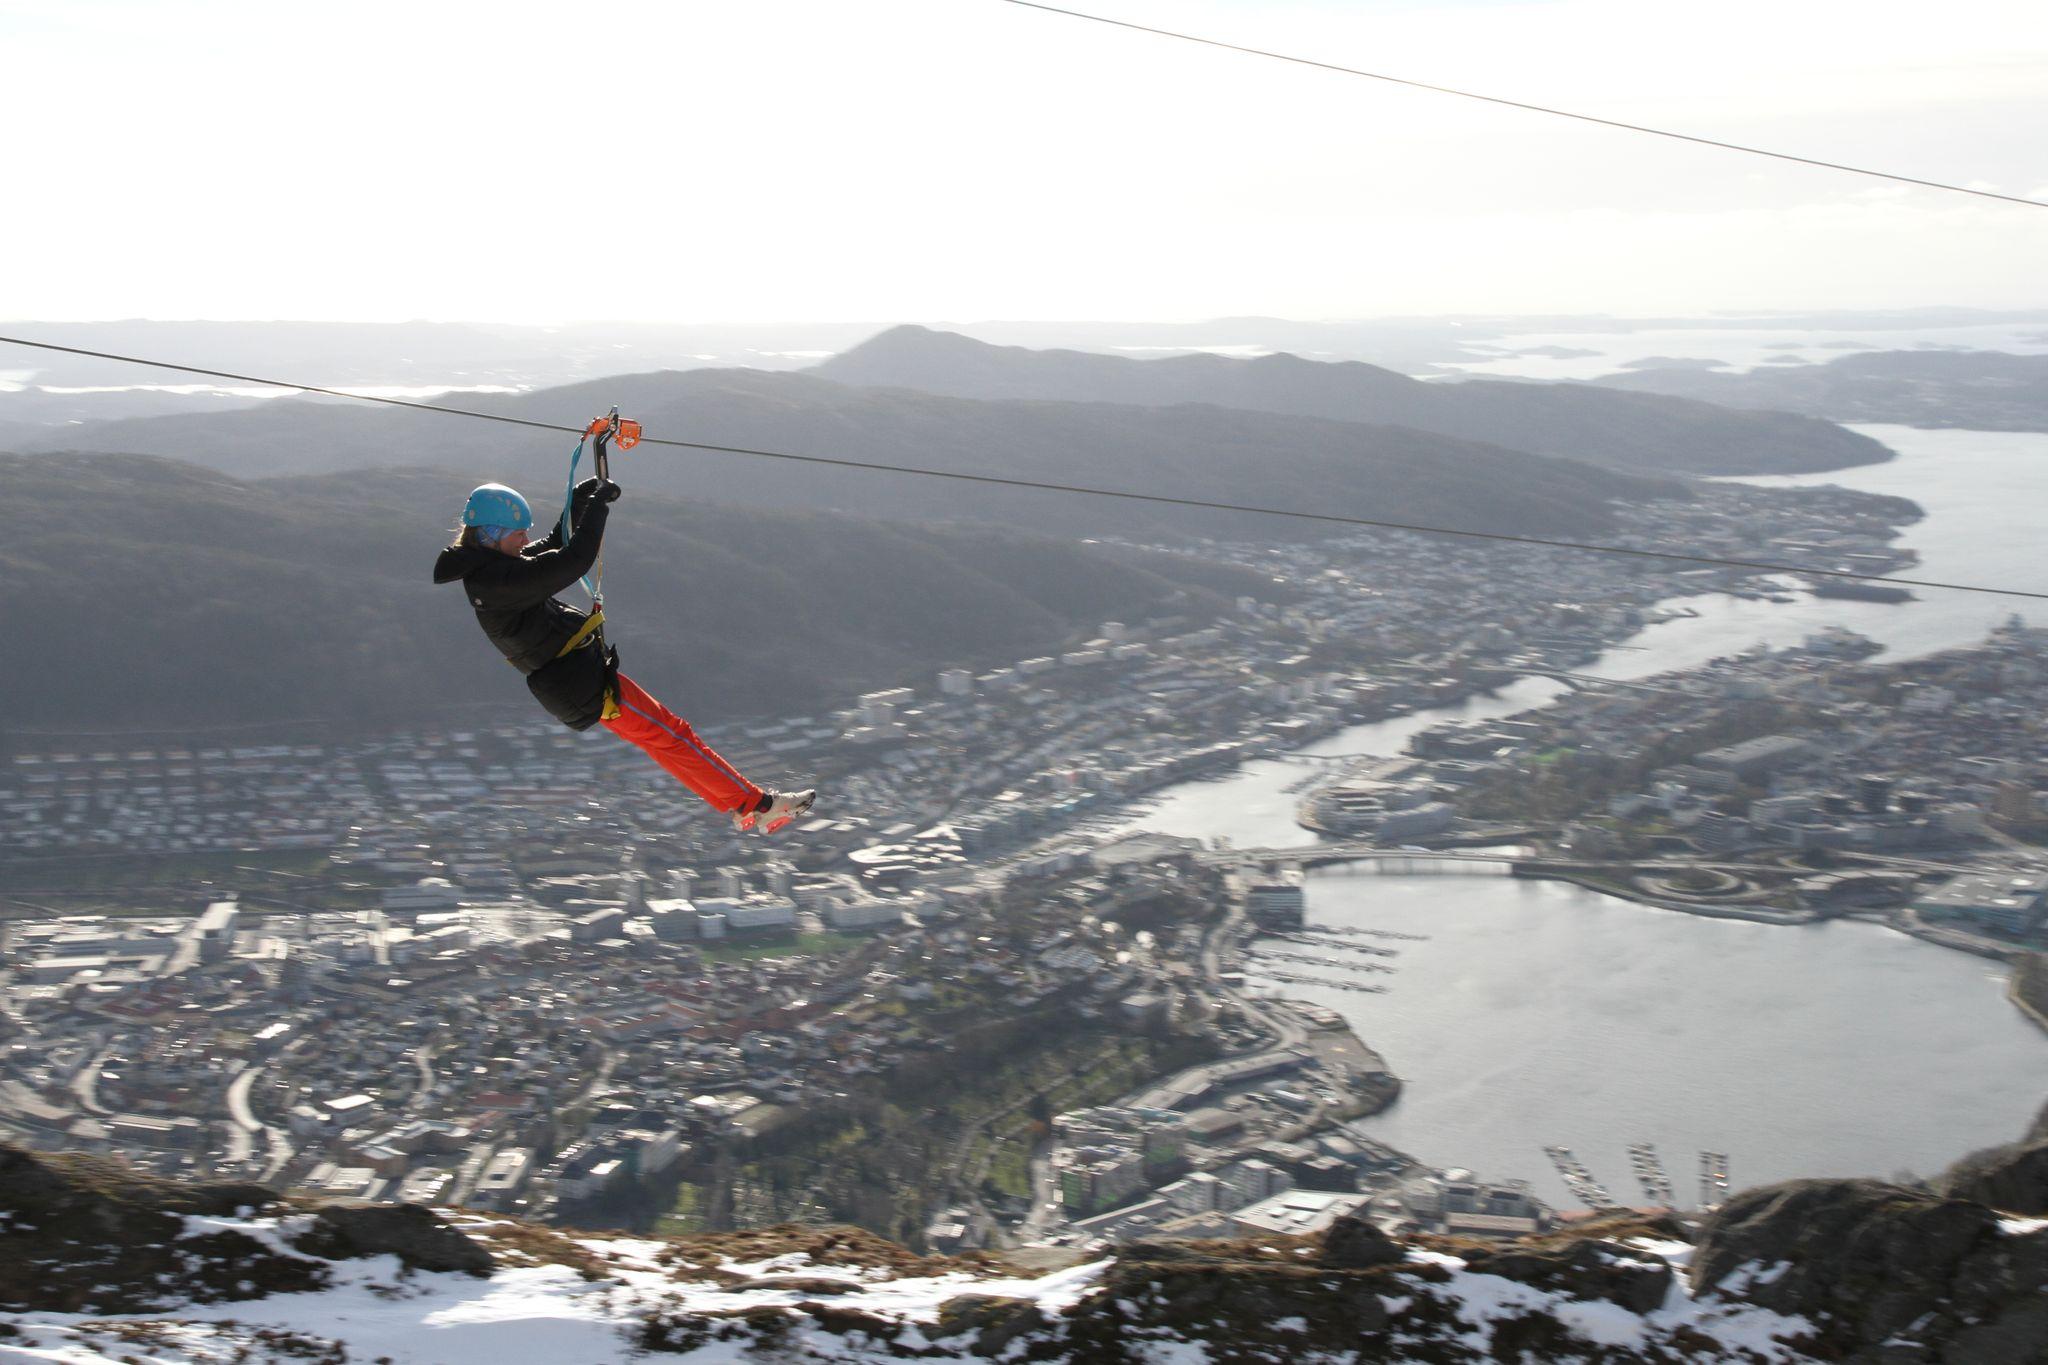 The fastest zipline in Norway